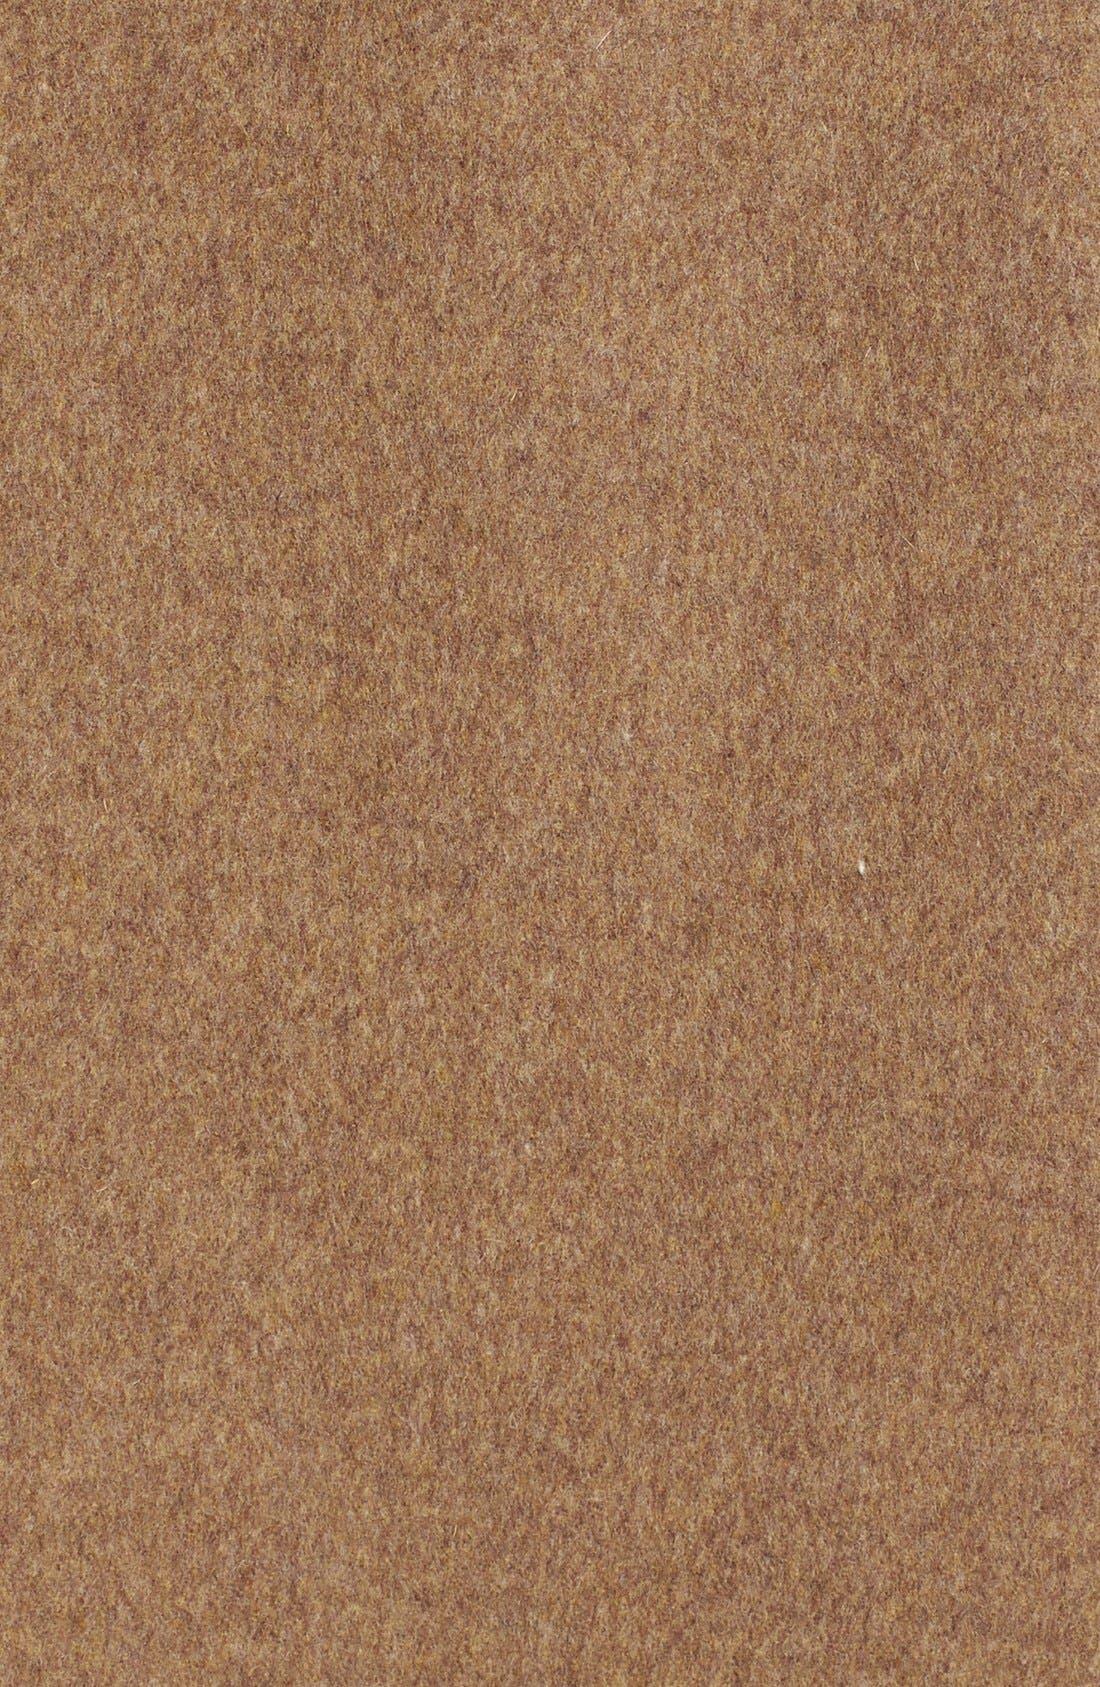 Alternate Image 3  - Sofie D'Hoore 'Click' Wool & Cashmere Long Coat